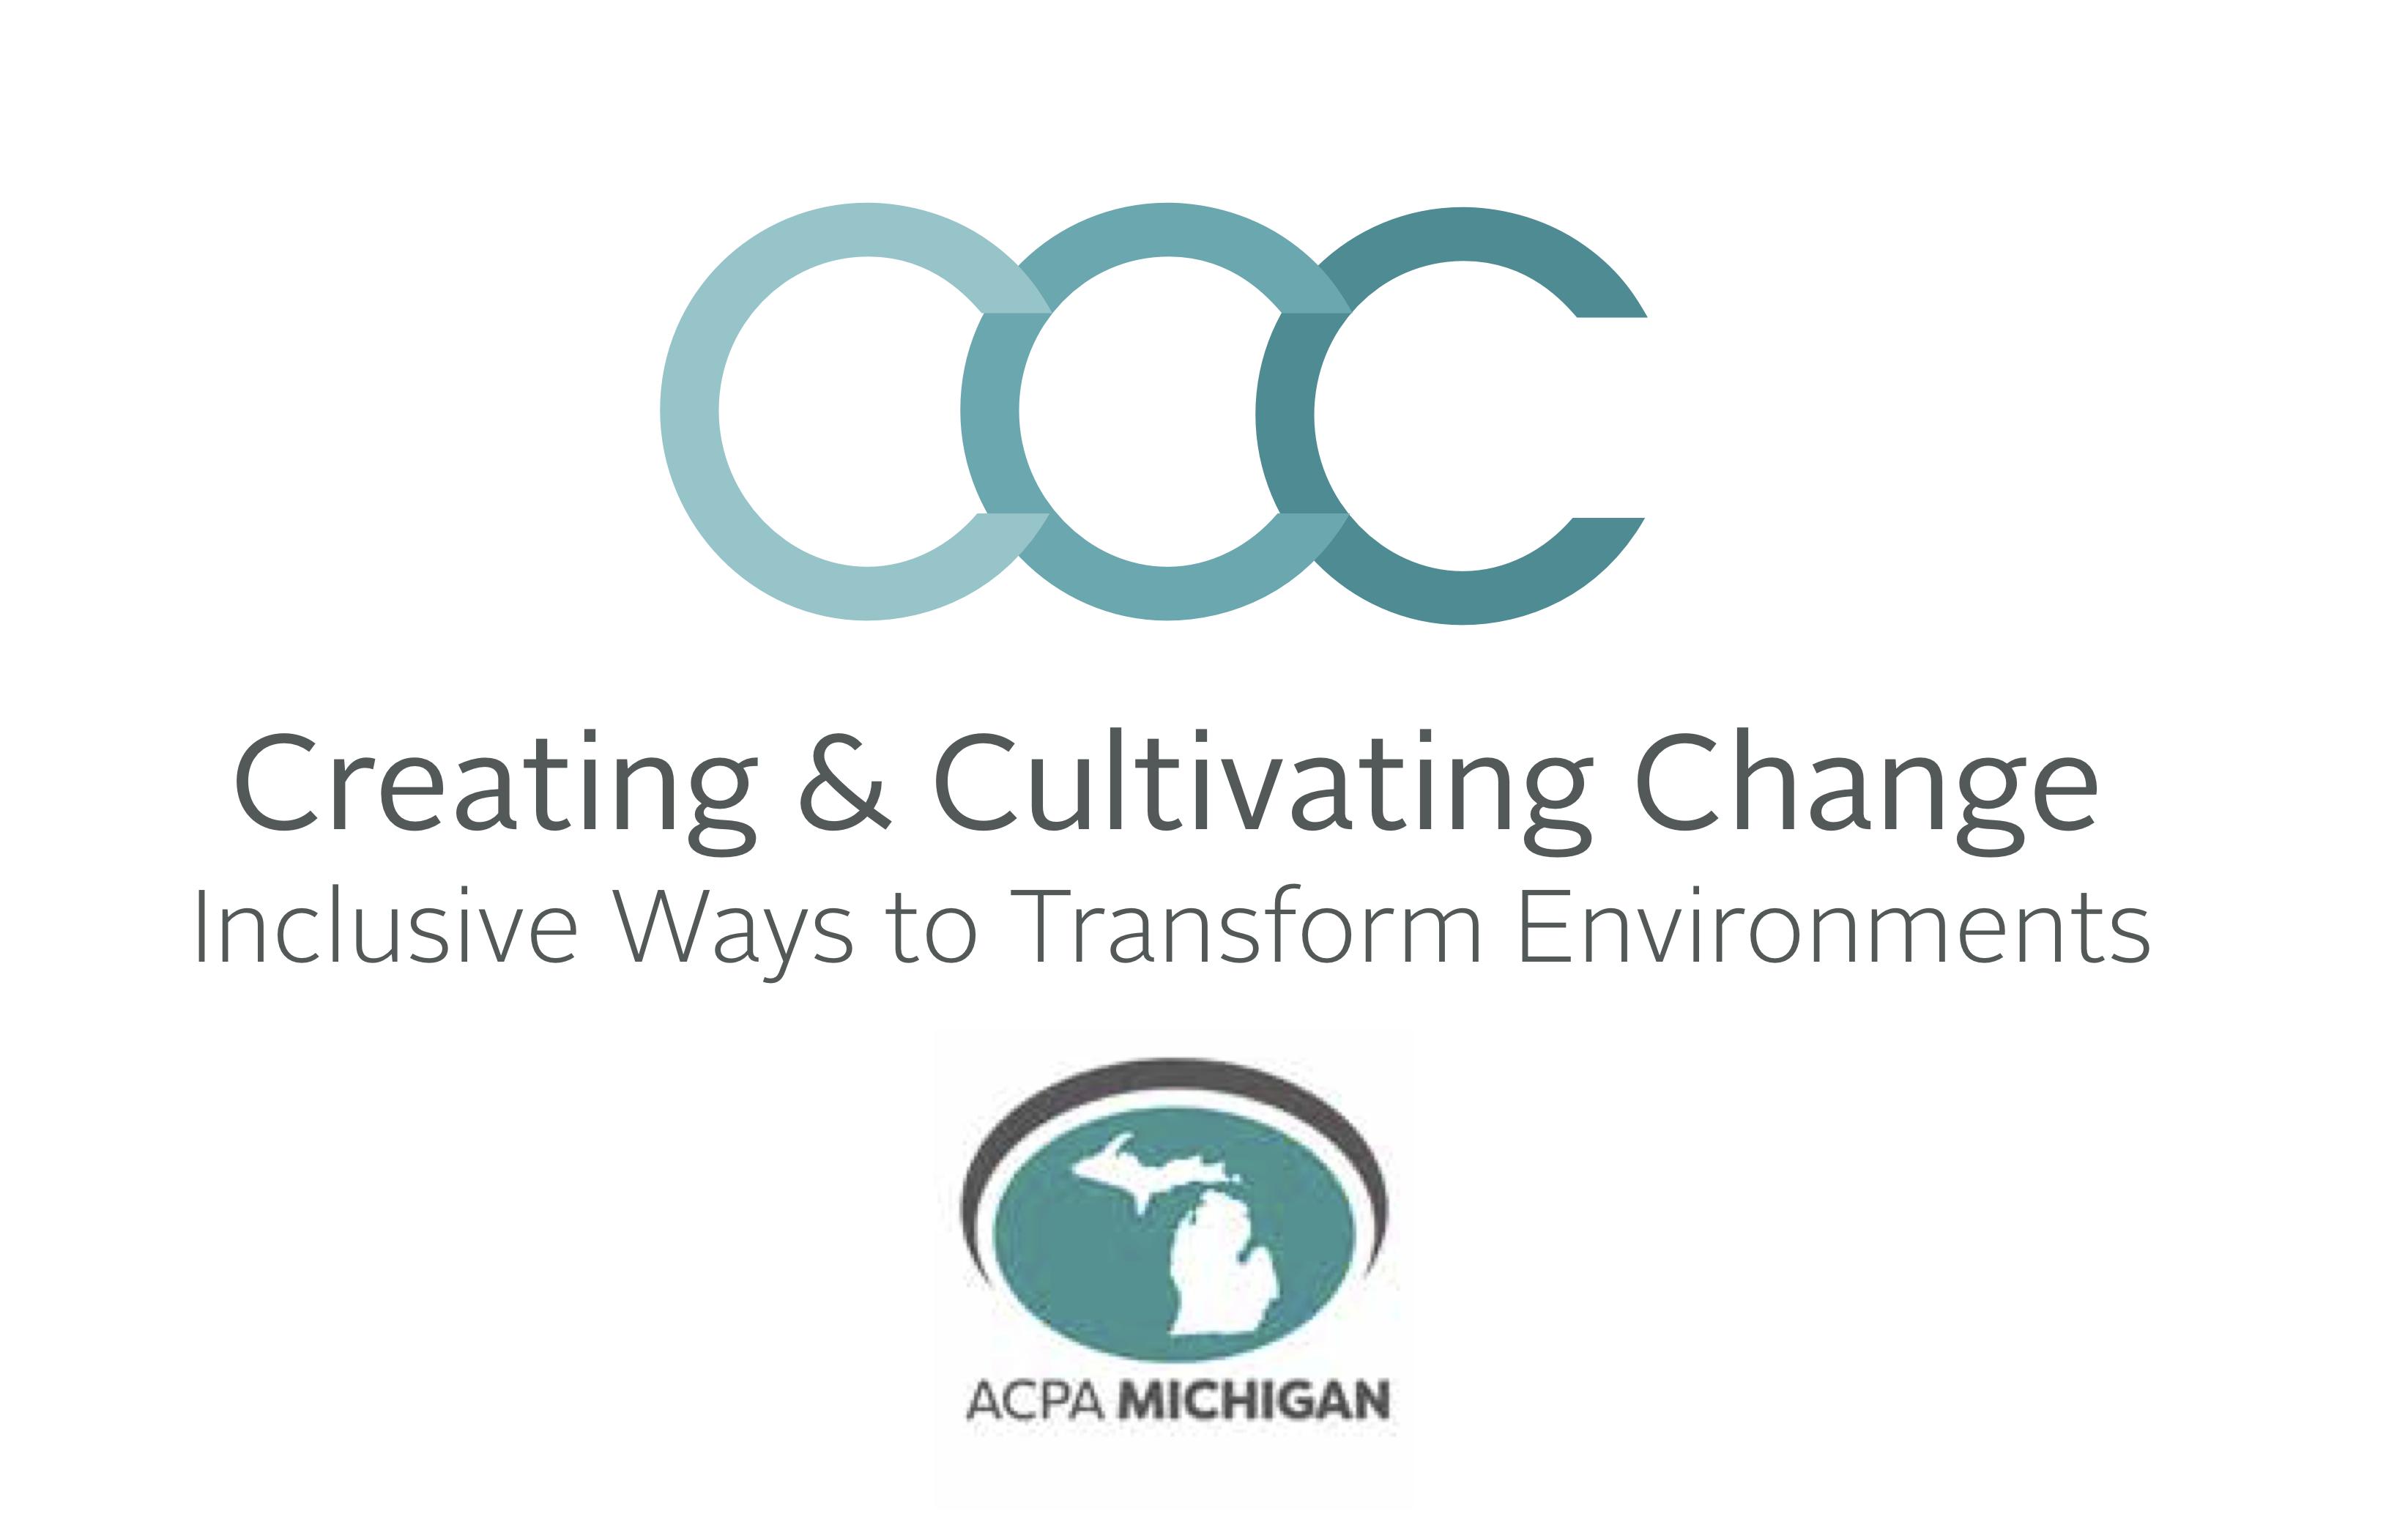 ACPA CCC logo small